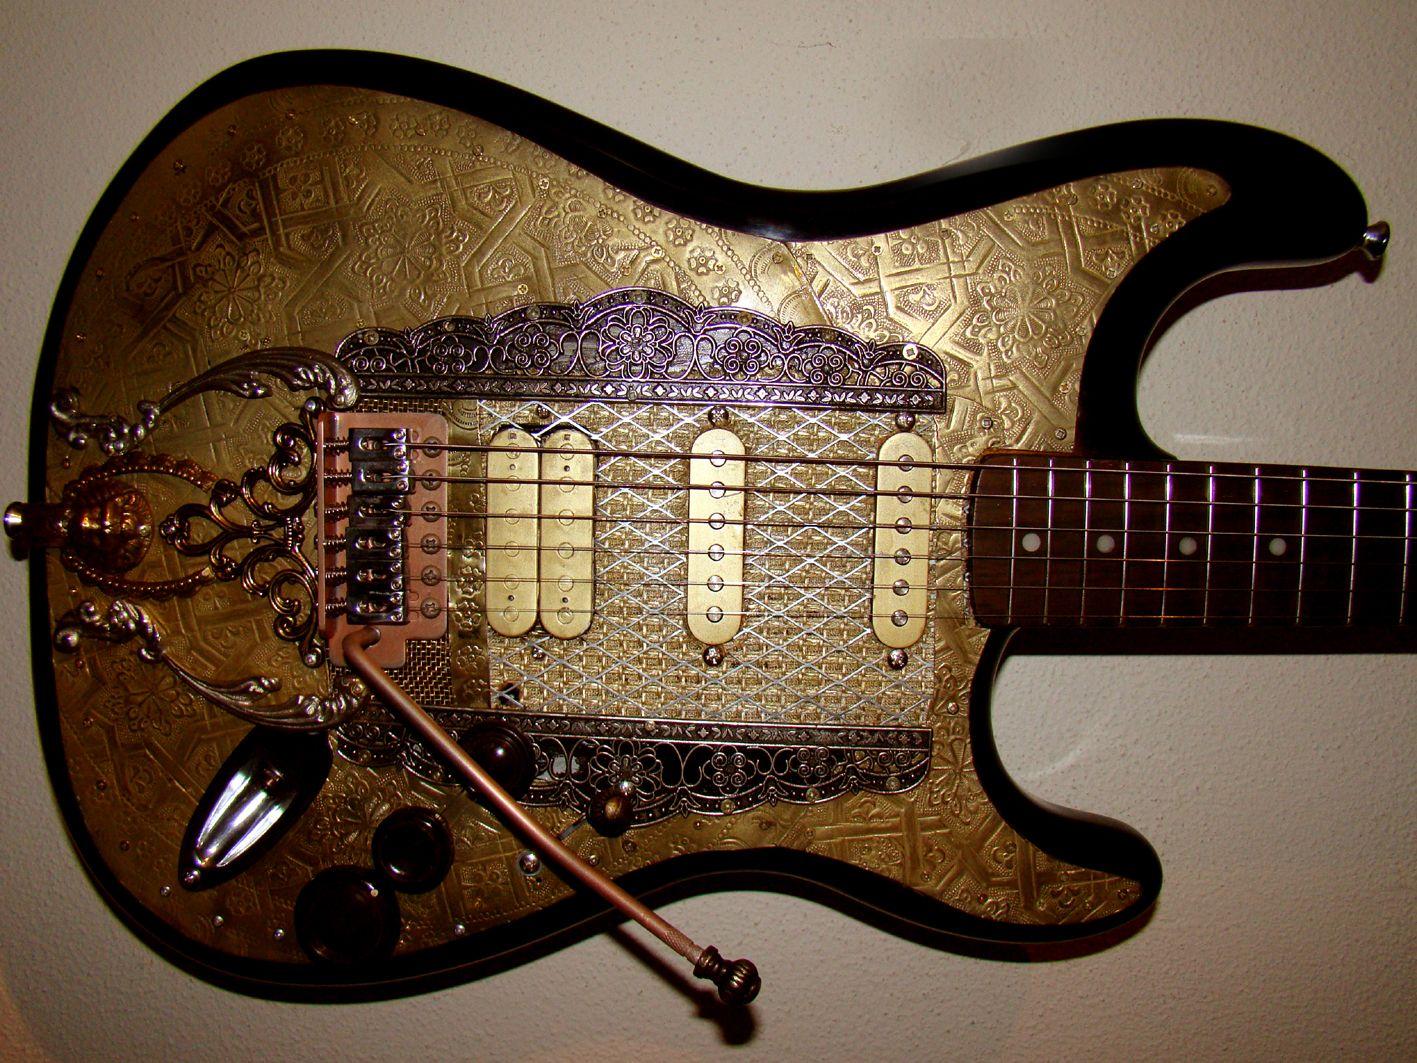 Customized Guitar named Nomad